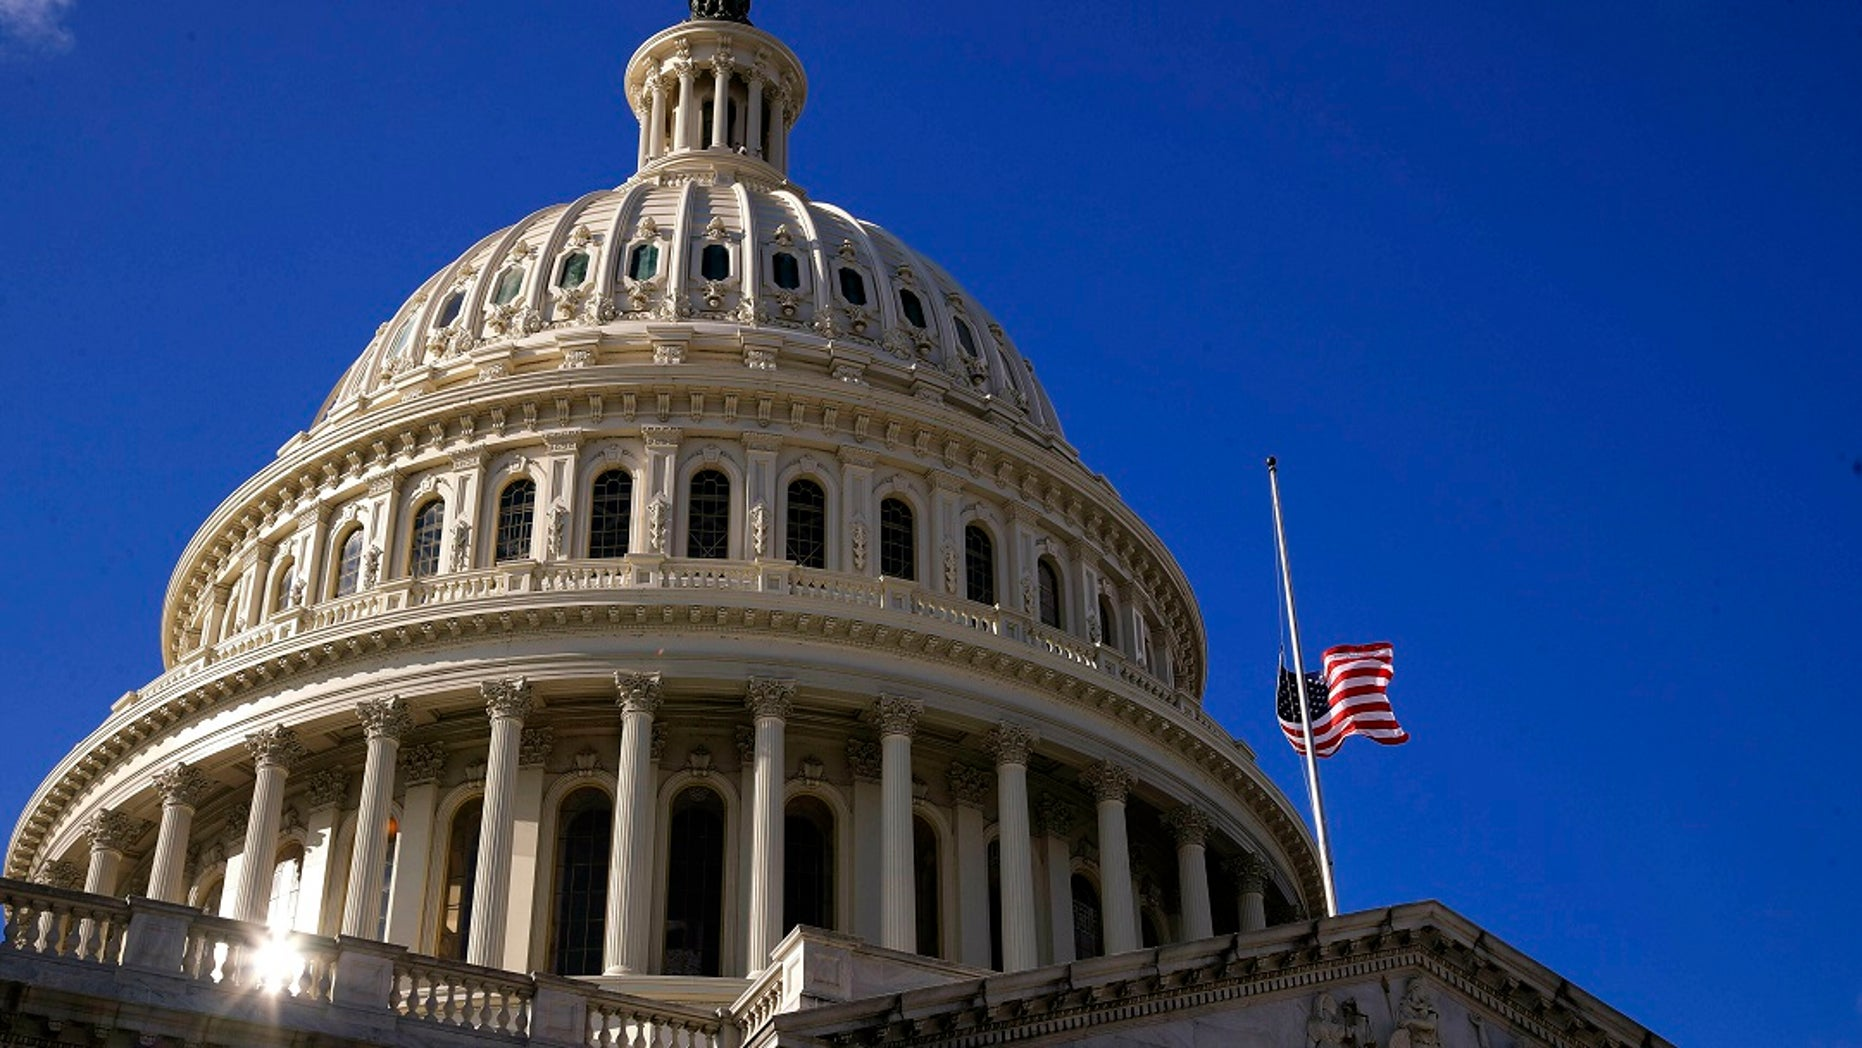 The U.S. Capitol dome in Washington. The 116th Congress is hitting its 100-day mark. (AP Photo/Manuel Balce Ceneta, File)